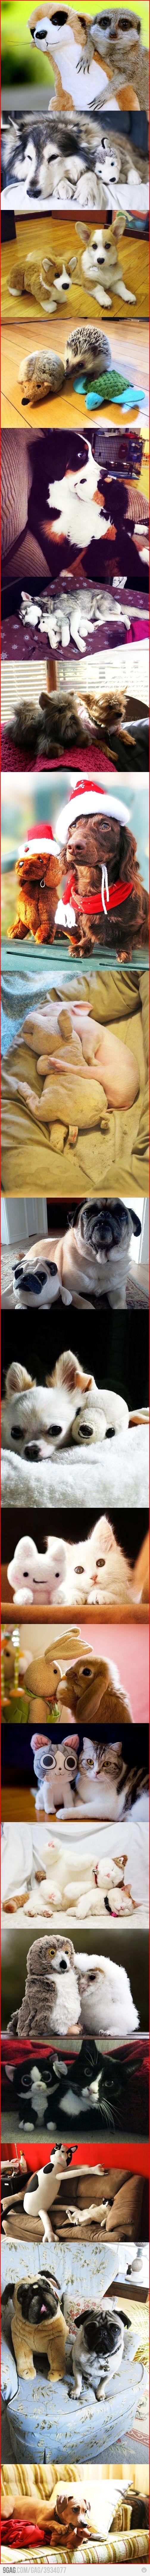 Animals & Their Stuffed Animals